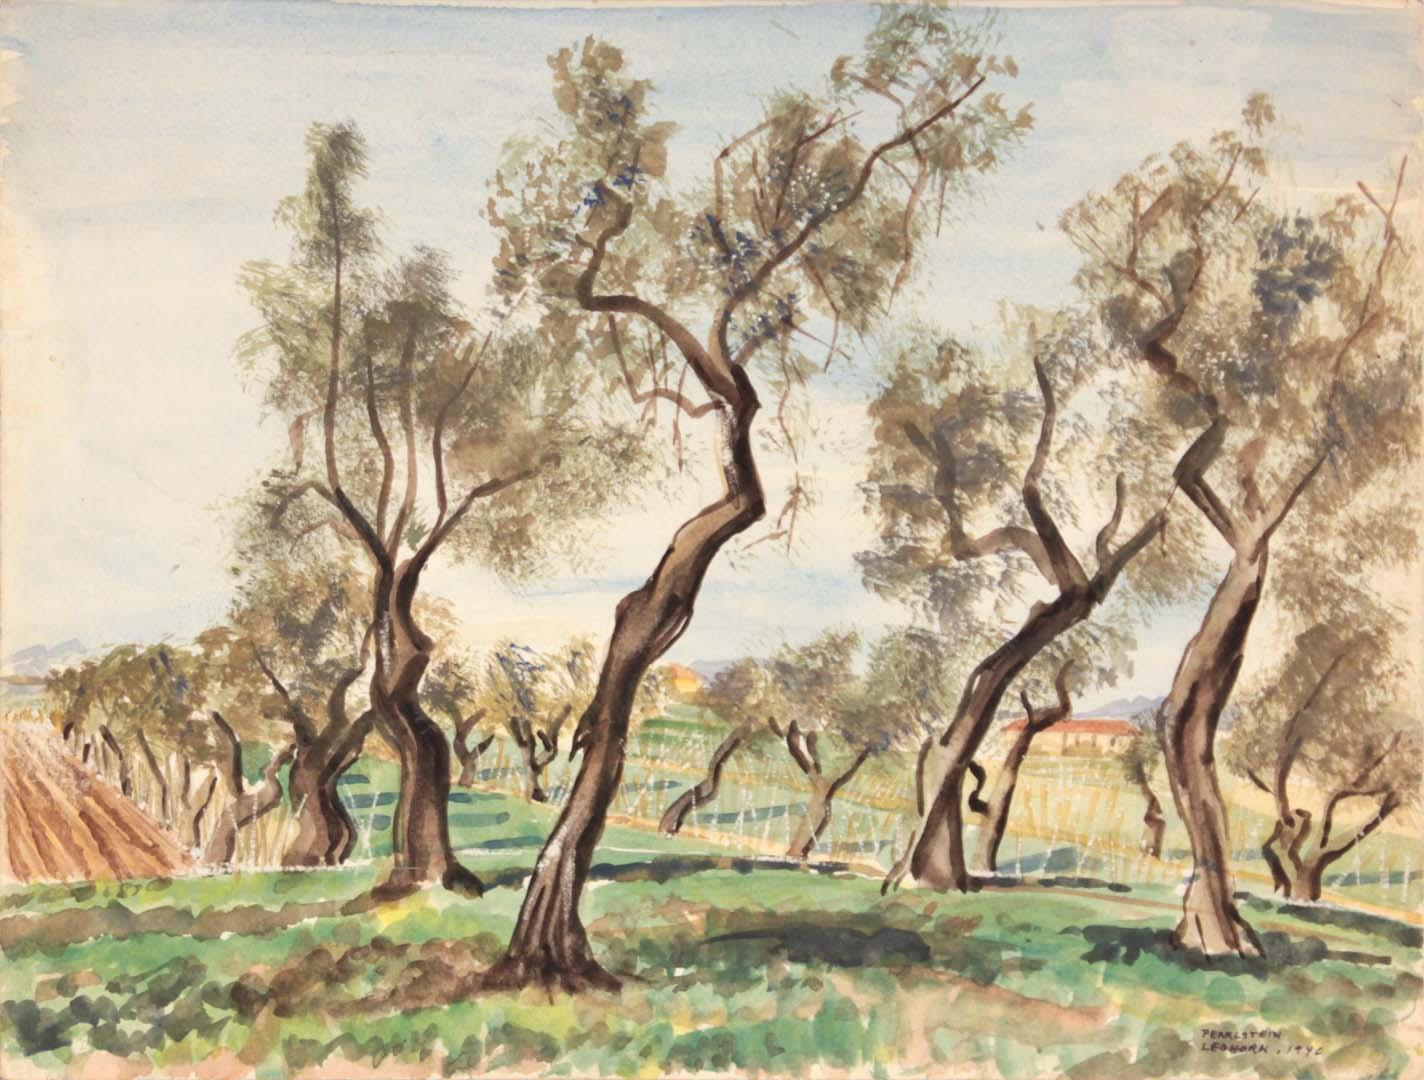 1946 Leghorn Watercolor 9 x 11.875